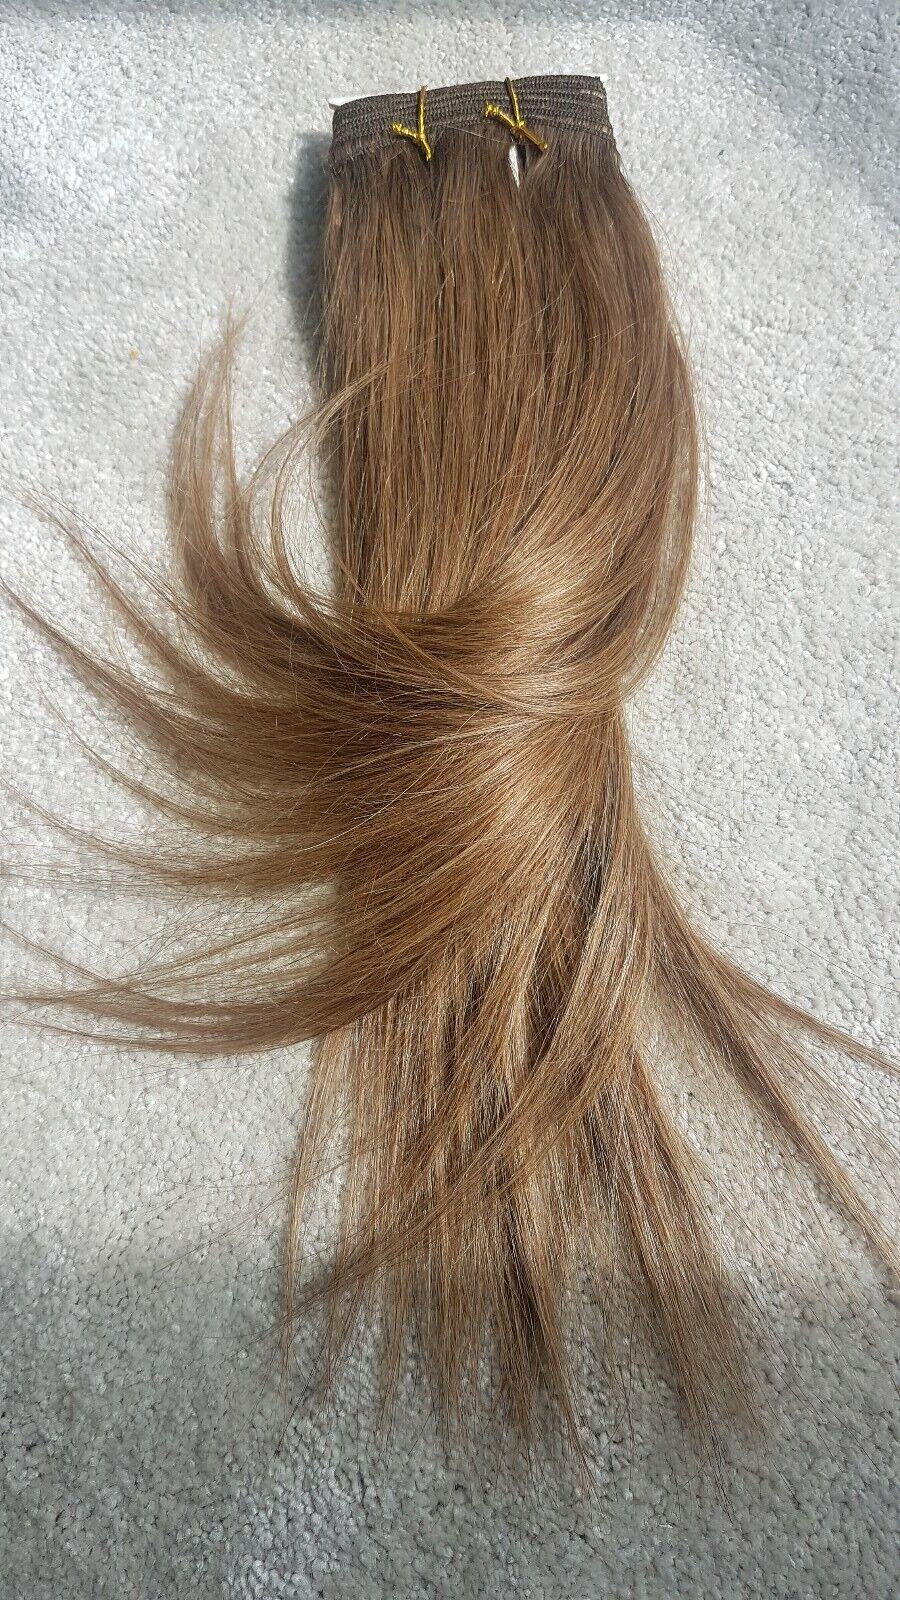 Human Hair Rooting Reborn Babies Toddlers Straight 100g Light braun NOT Mohair